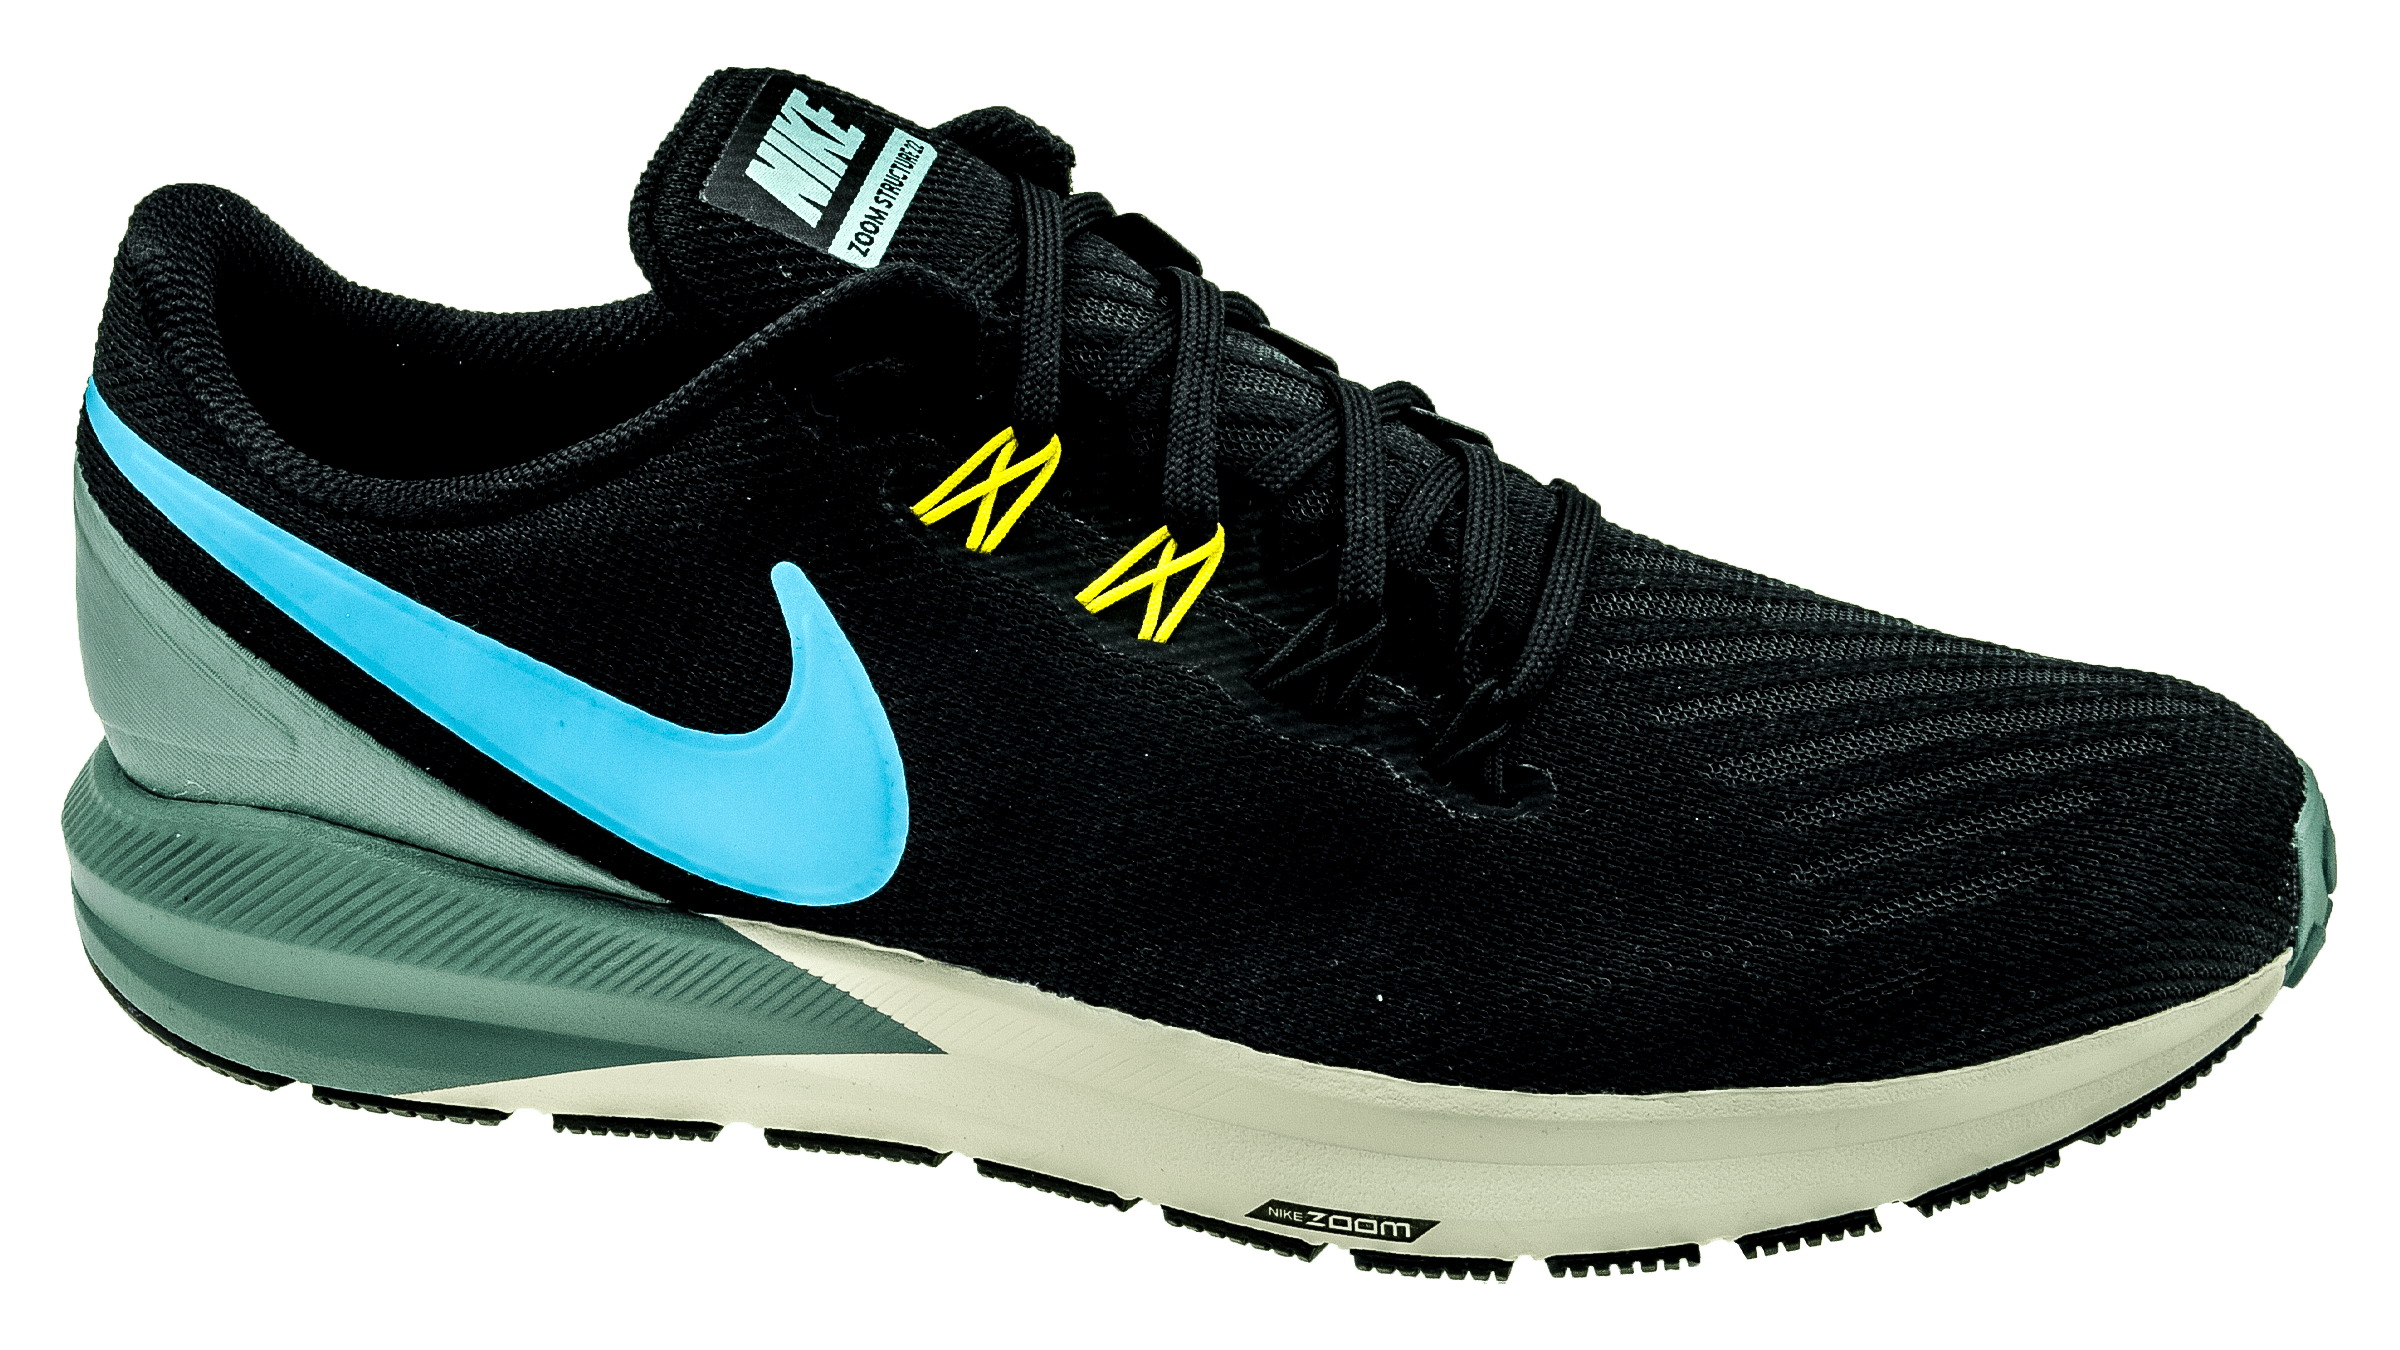 new arrival 1eb5b 8ea8b Nike Air Zoom Structure 22 black/blue fury/aviator grey